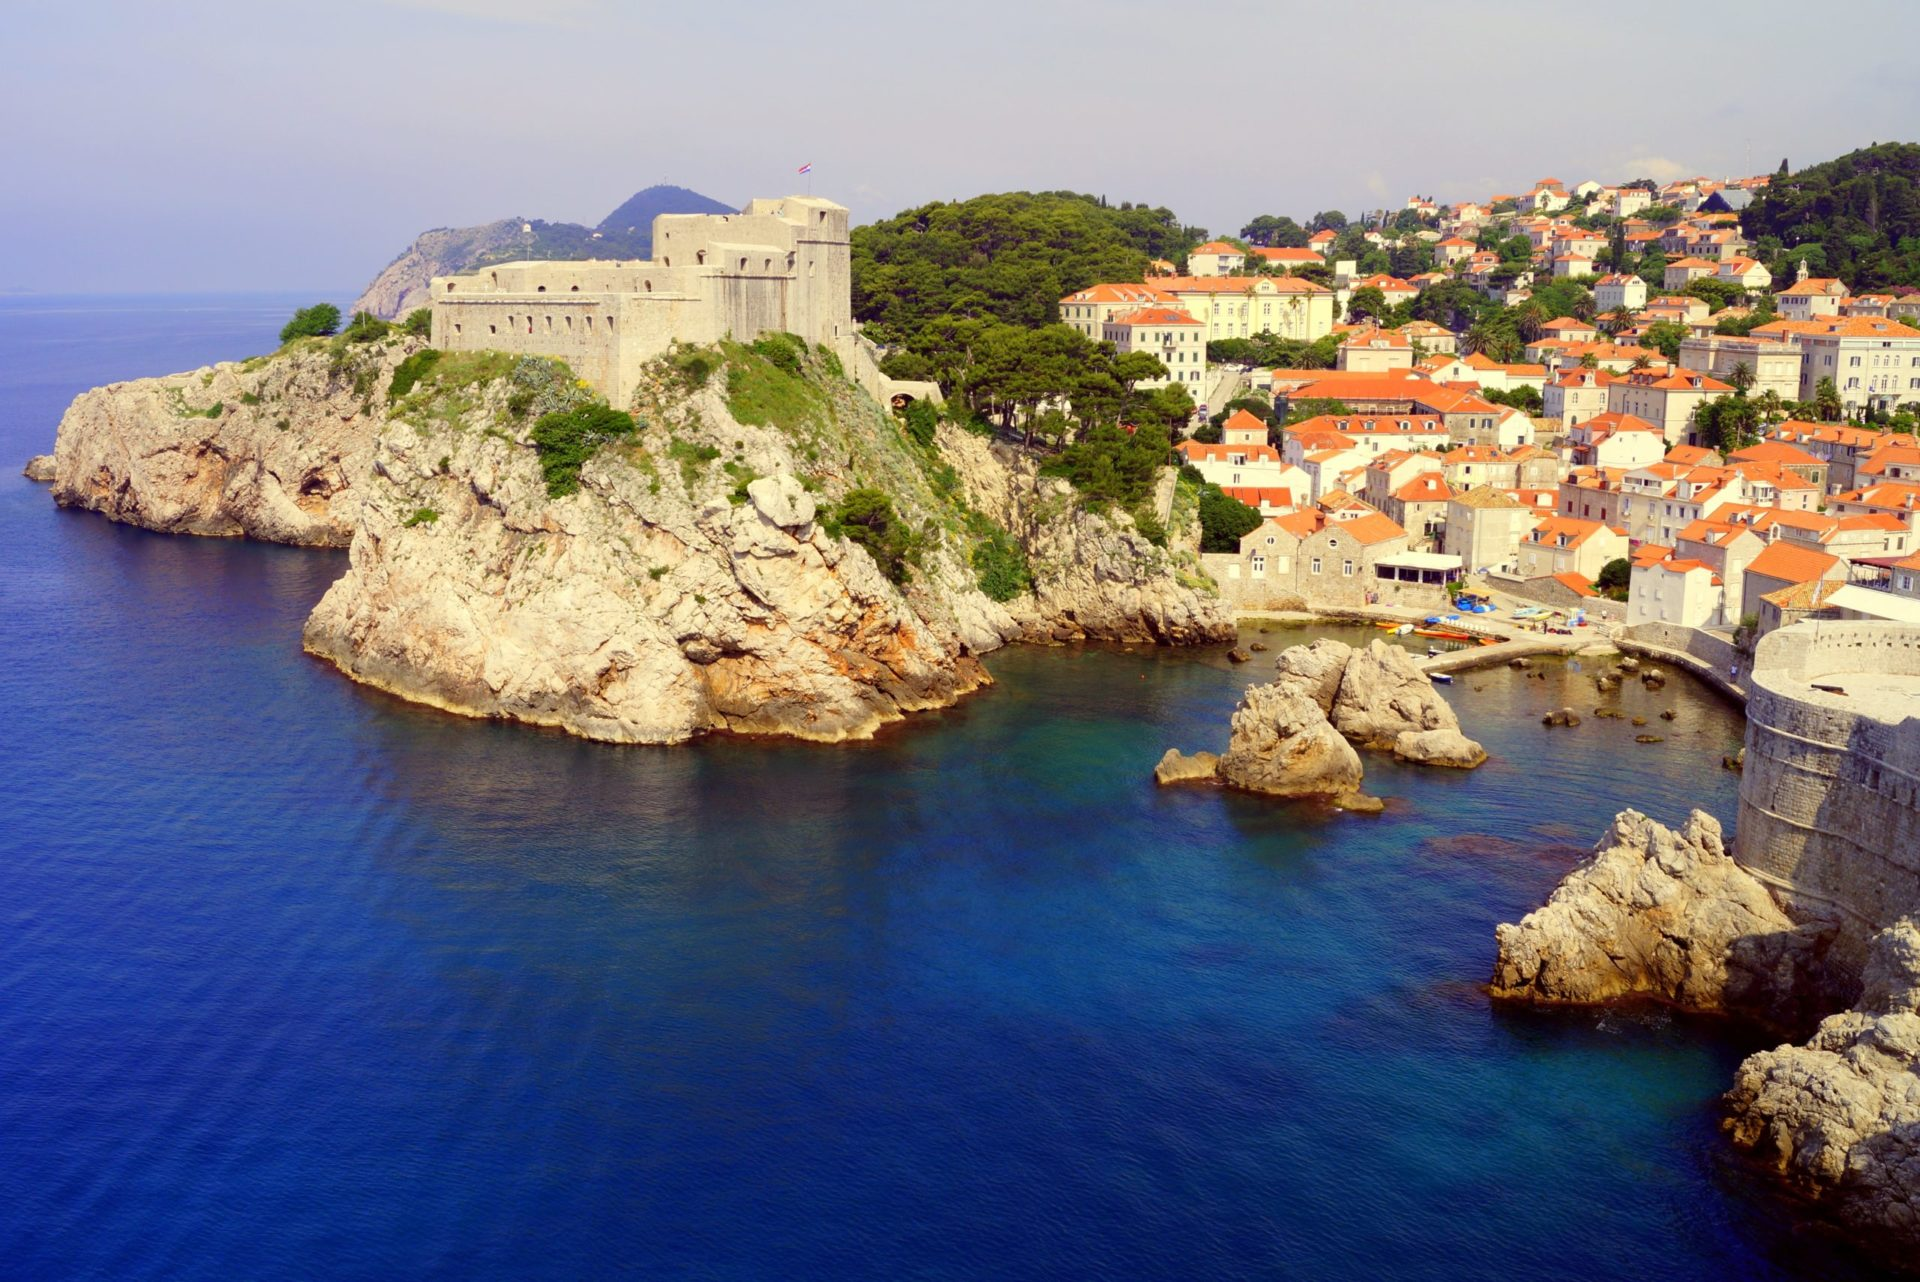 Wassertemperatur Dubrovnik: Festung Lovrijenac mit Meer und Altstadt